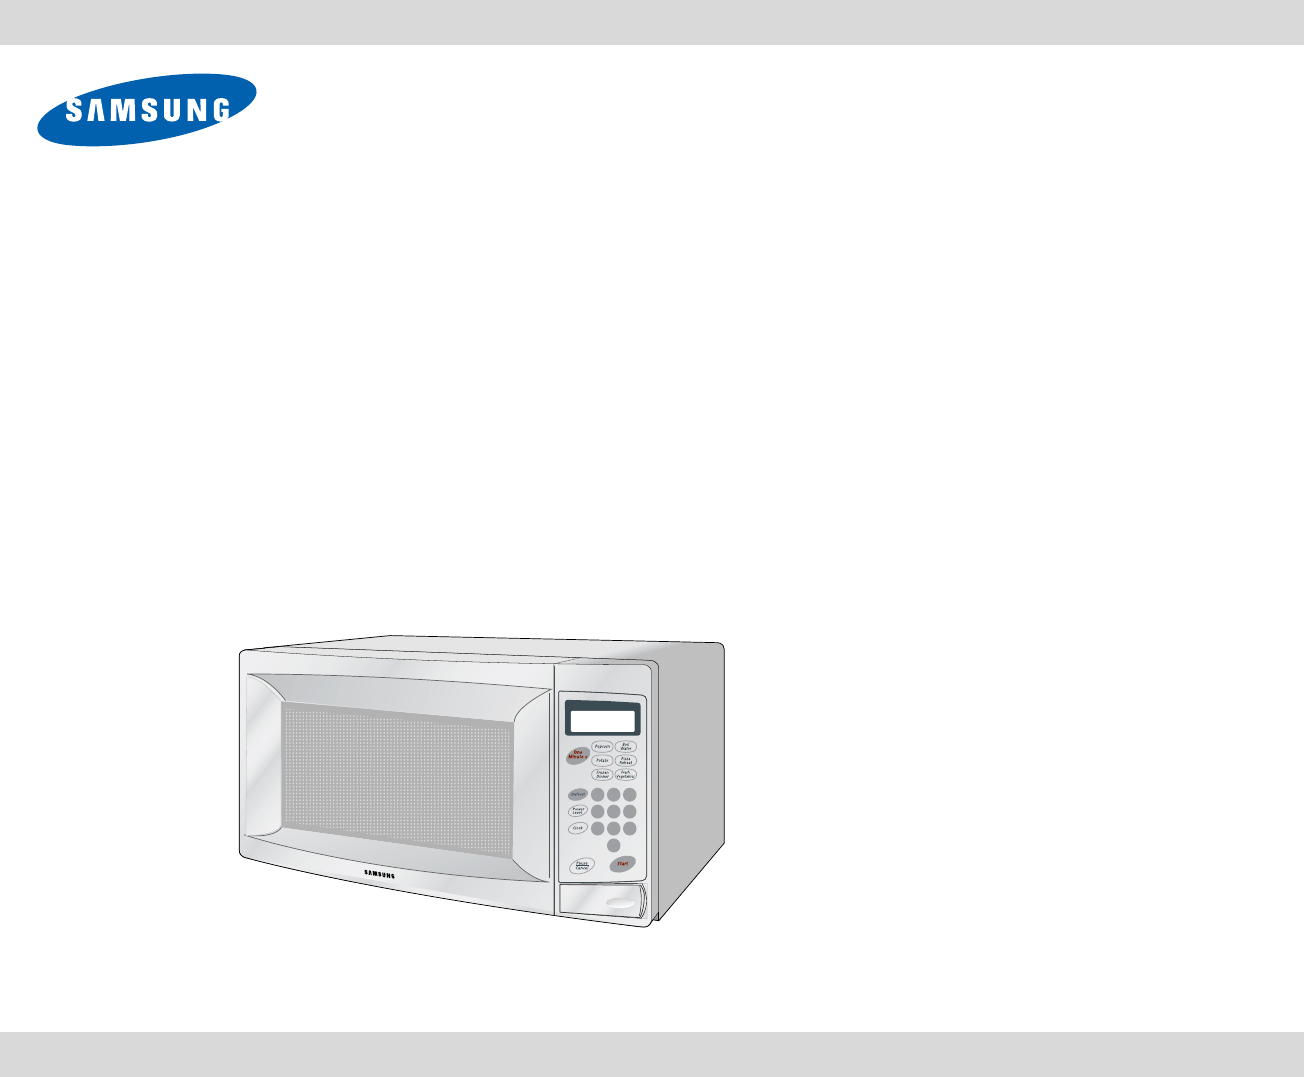 samsung mw730wb user manual download pdf